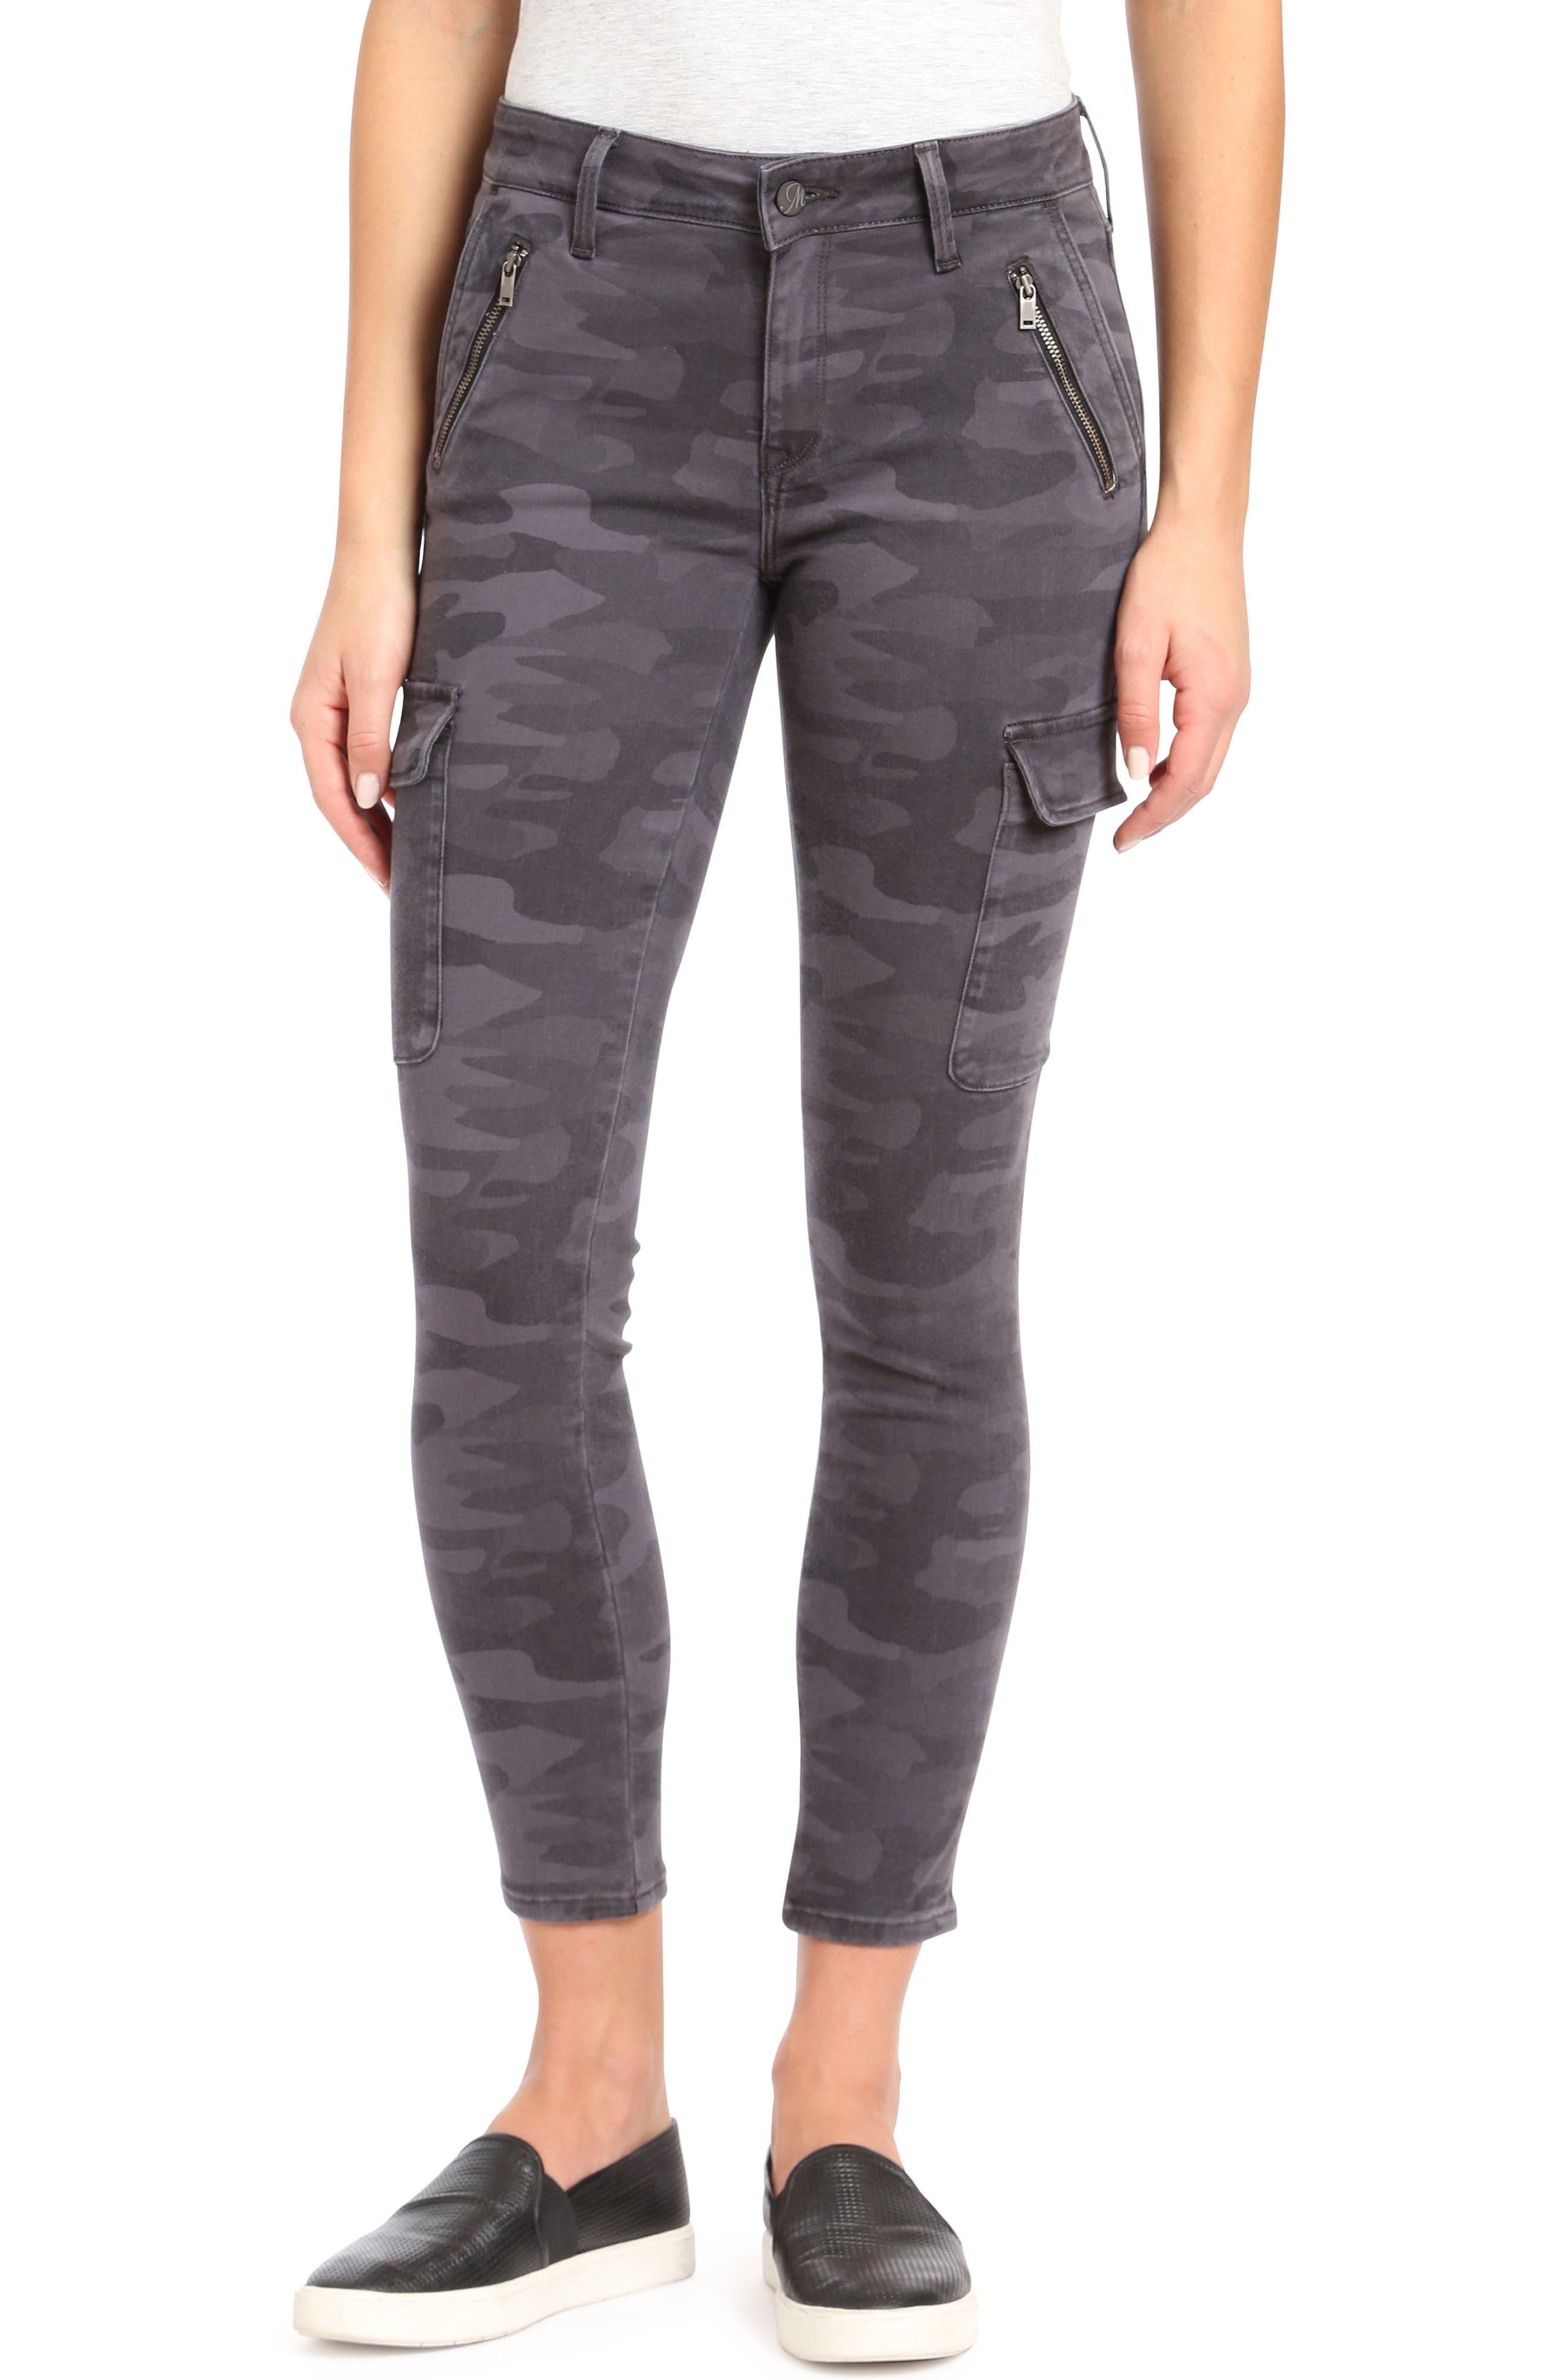 Mavi Jeans Juliette Camo Skinny Cargo Pants, Grey